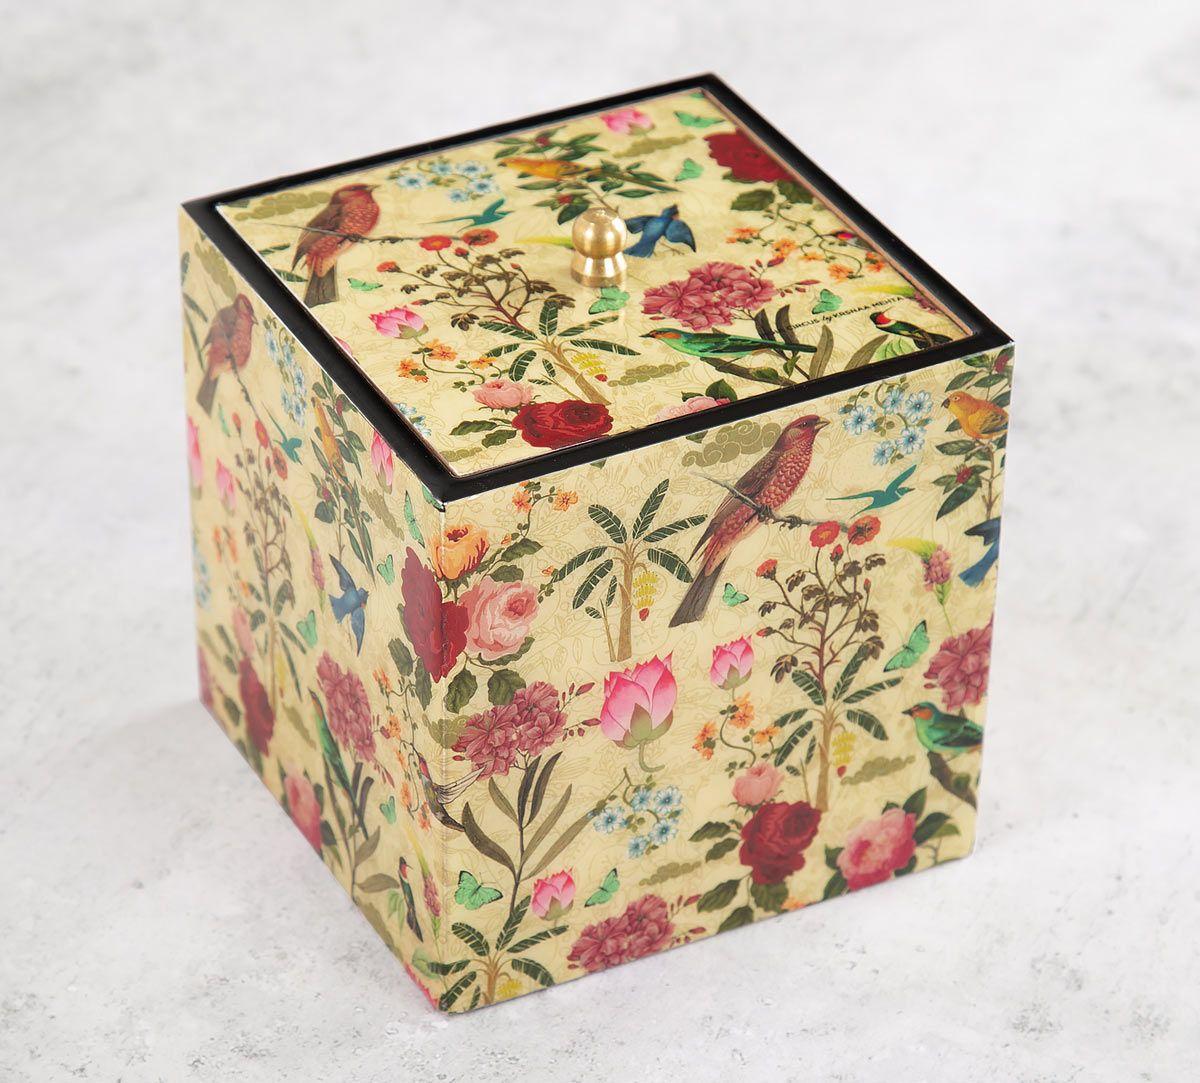 India Circus Bird Land Square Storage Box